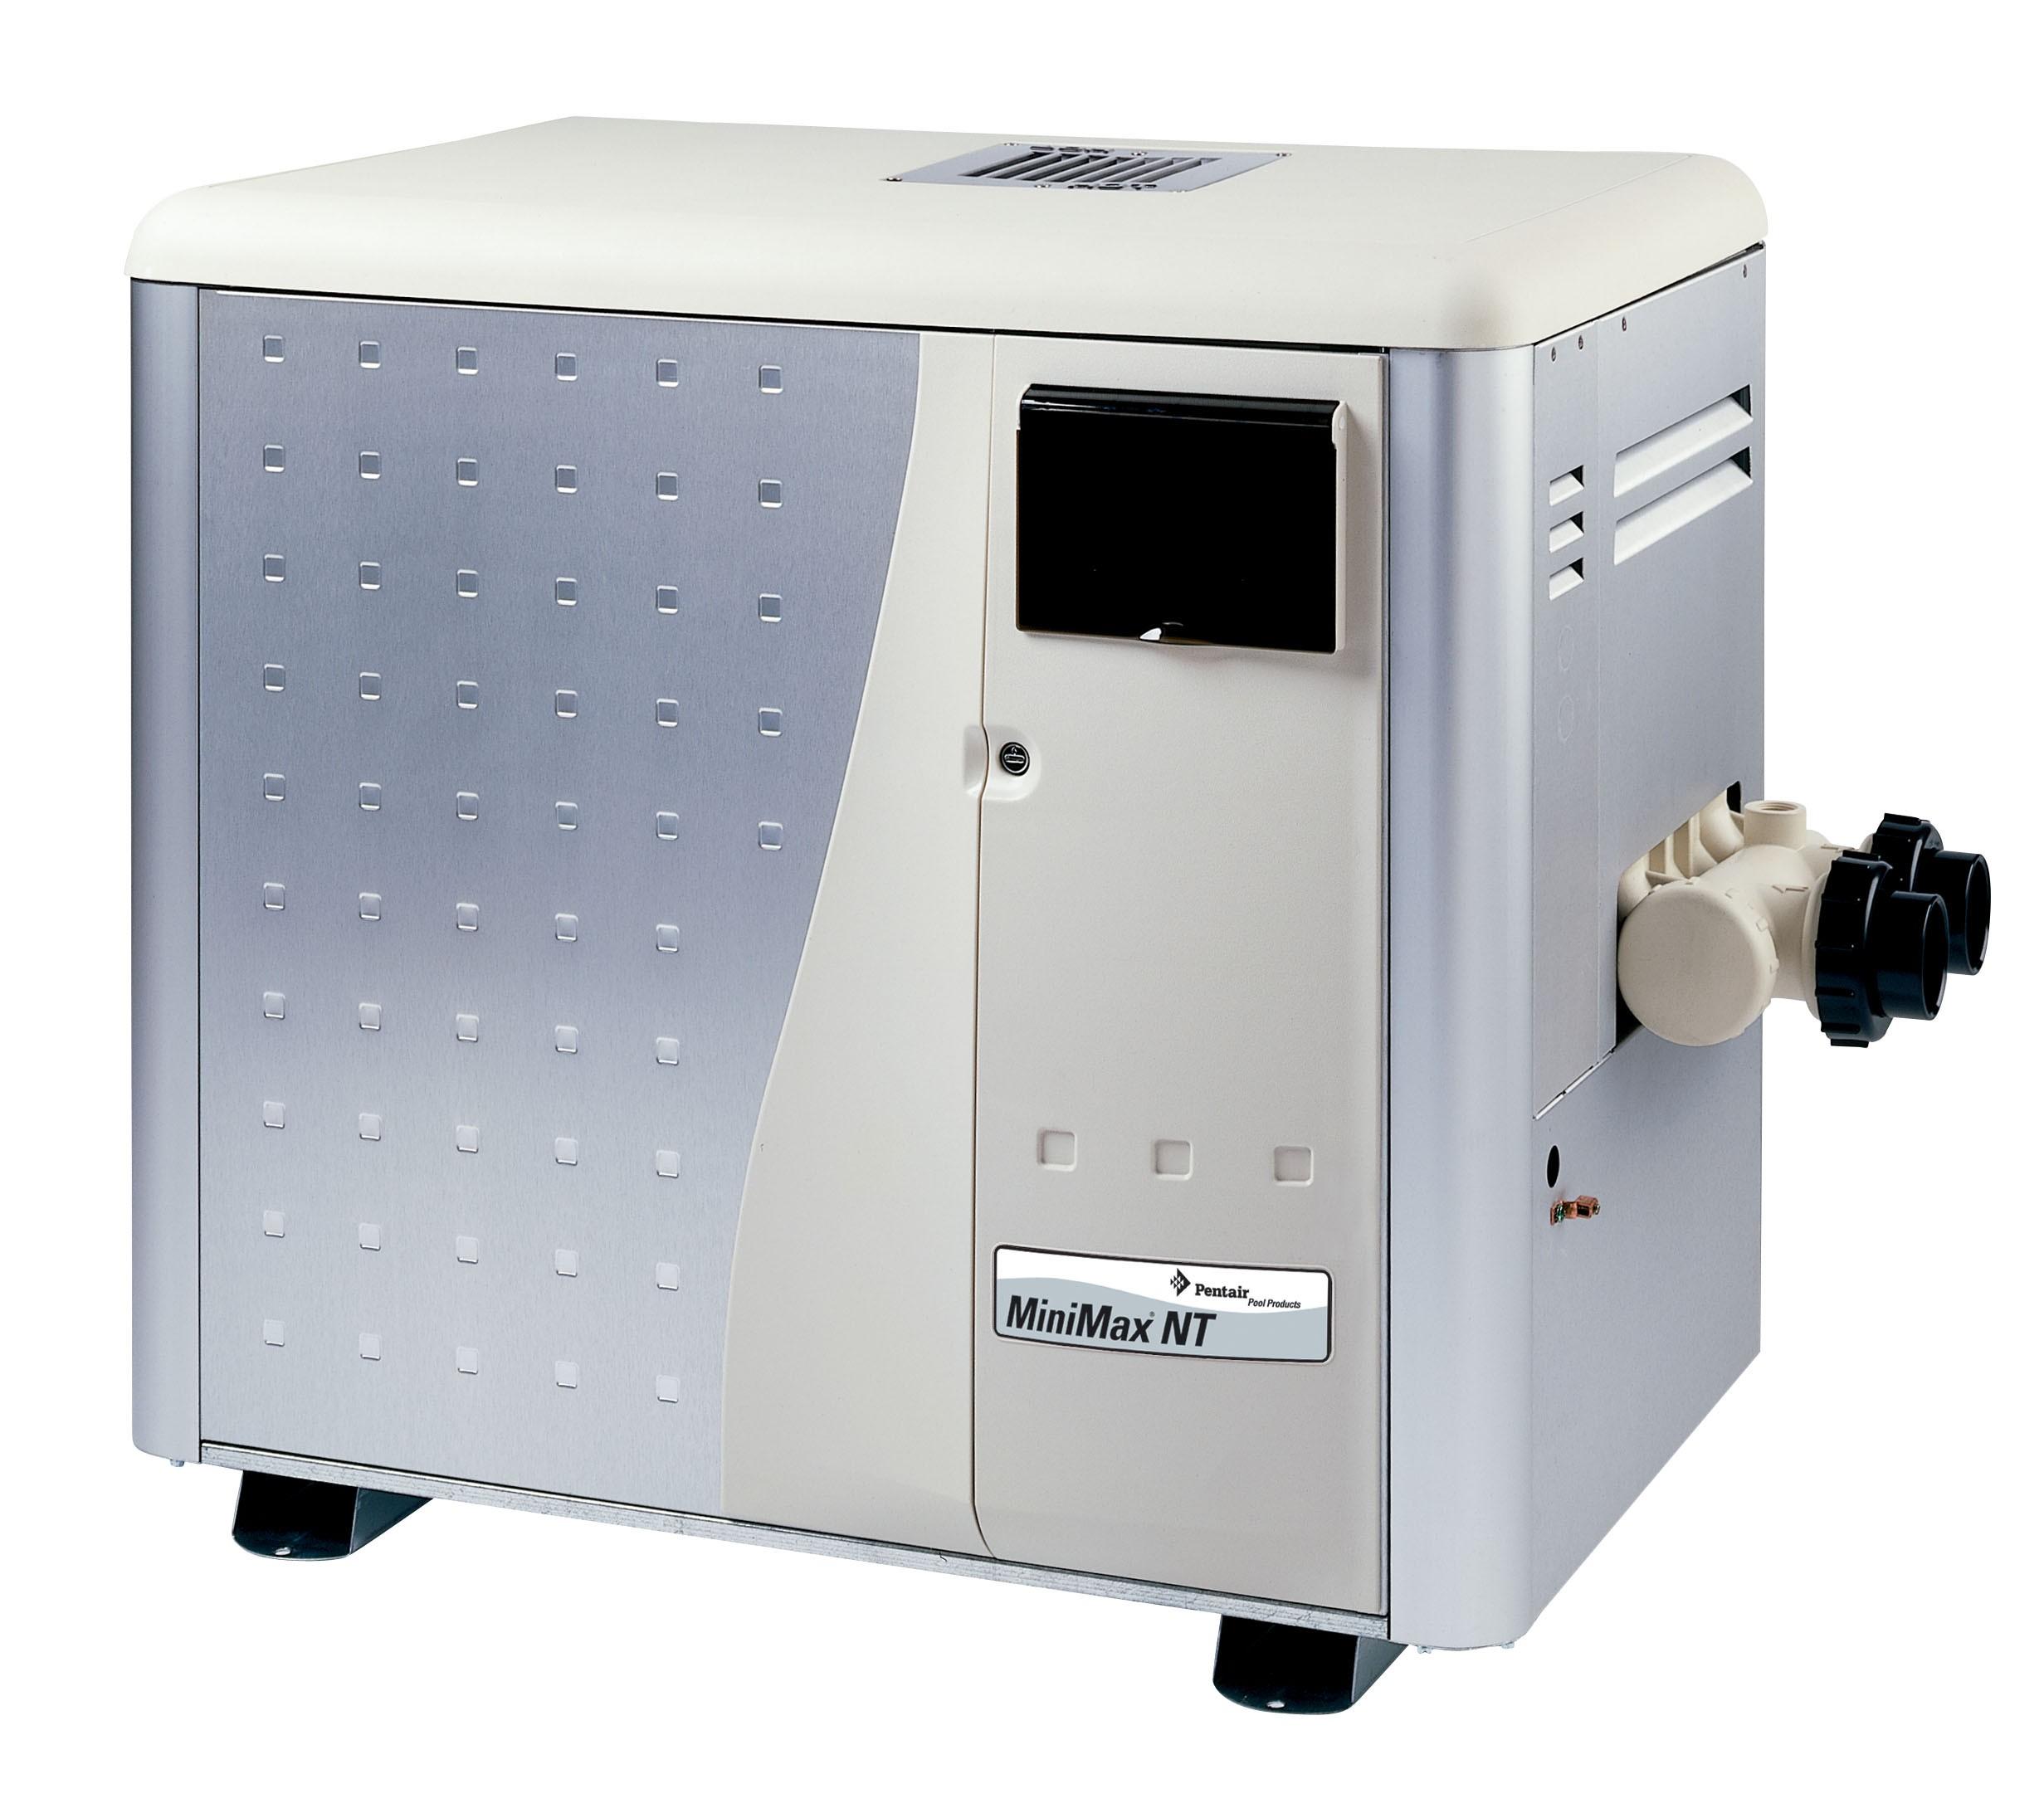 Showy Recalled Gas Heater Pentair Water Spa Recalls Gas Heaters Carbon Pentair Mastertemp 400 Error Code E05 Pentair Mastertemp 400 Manual houzz-03 Pentair Mastertemp 400